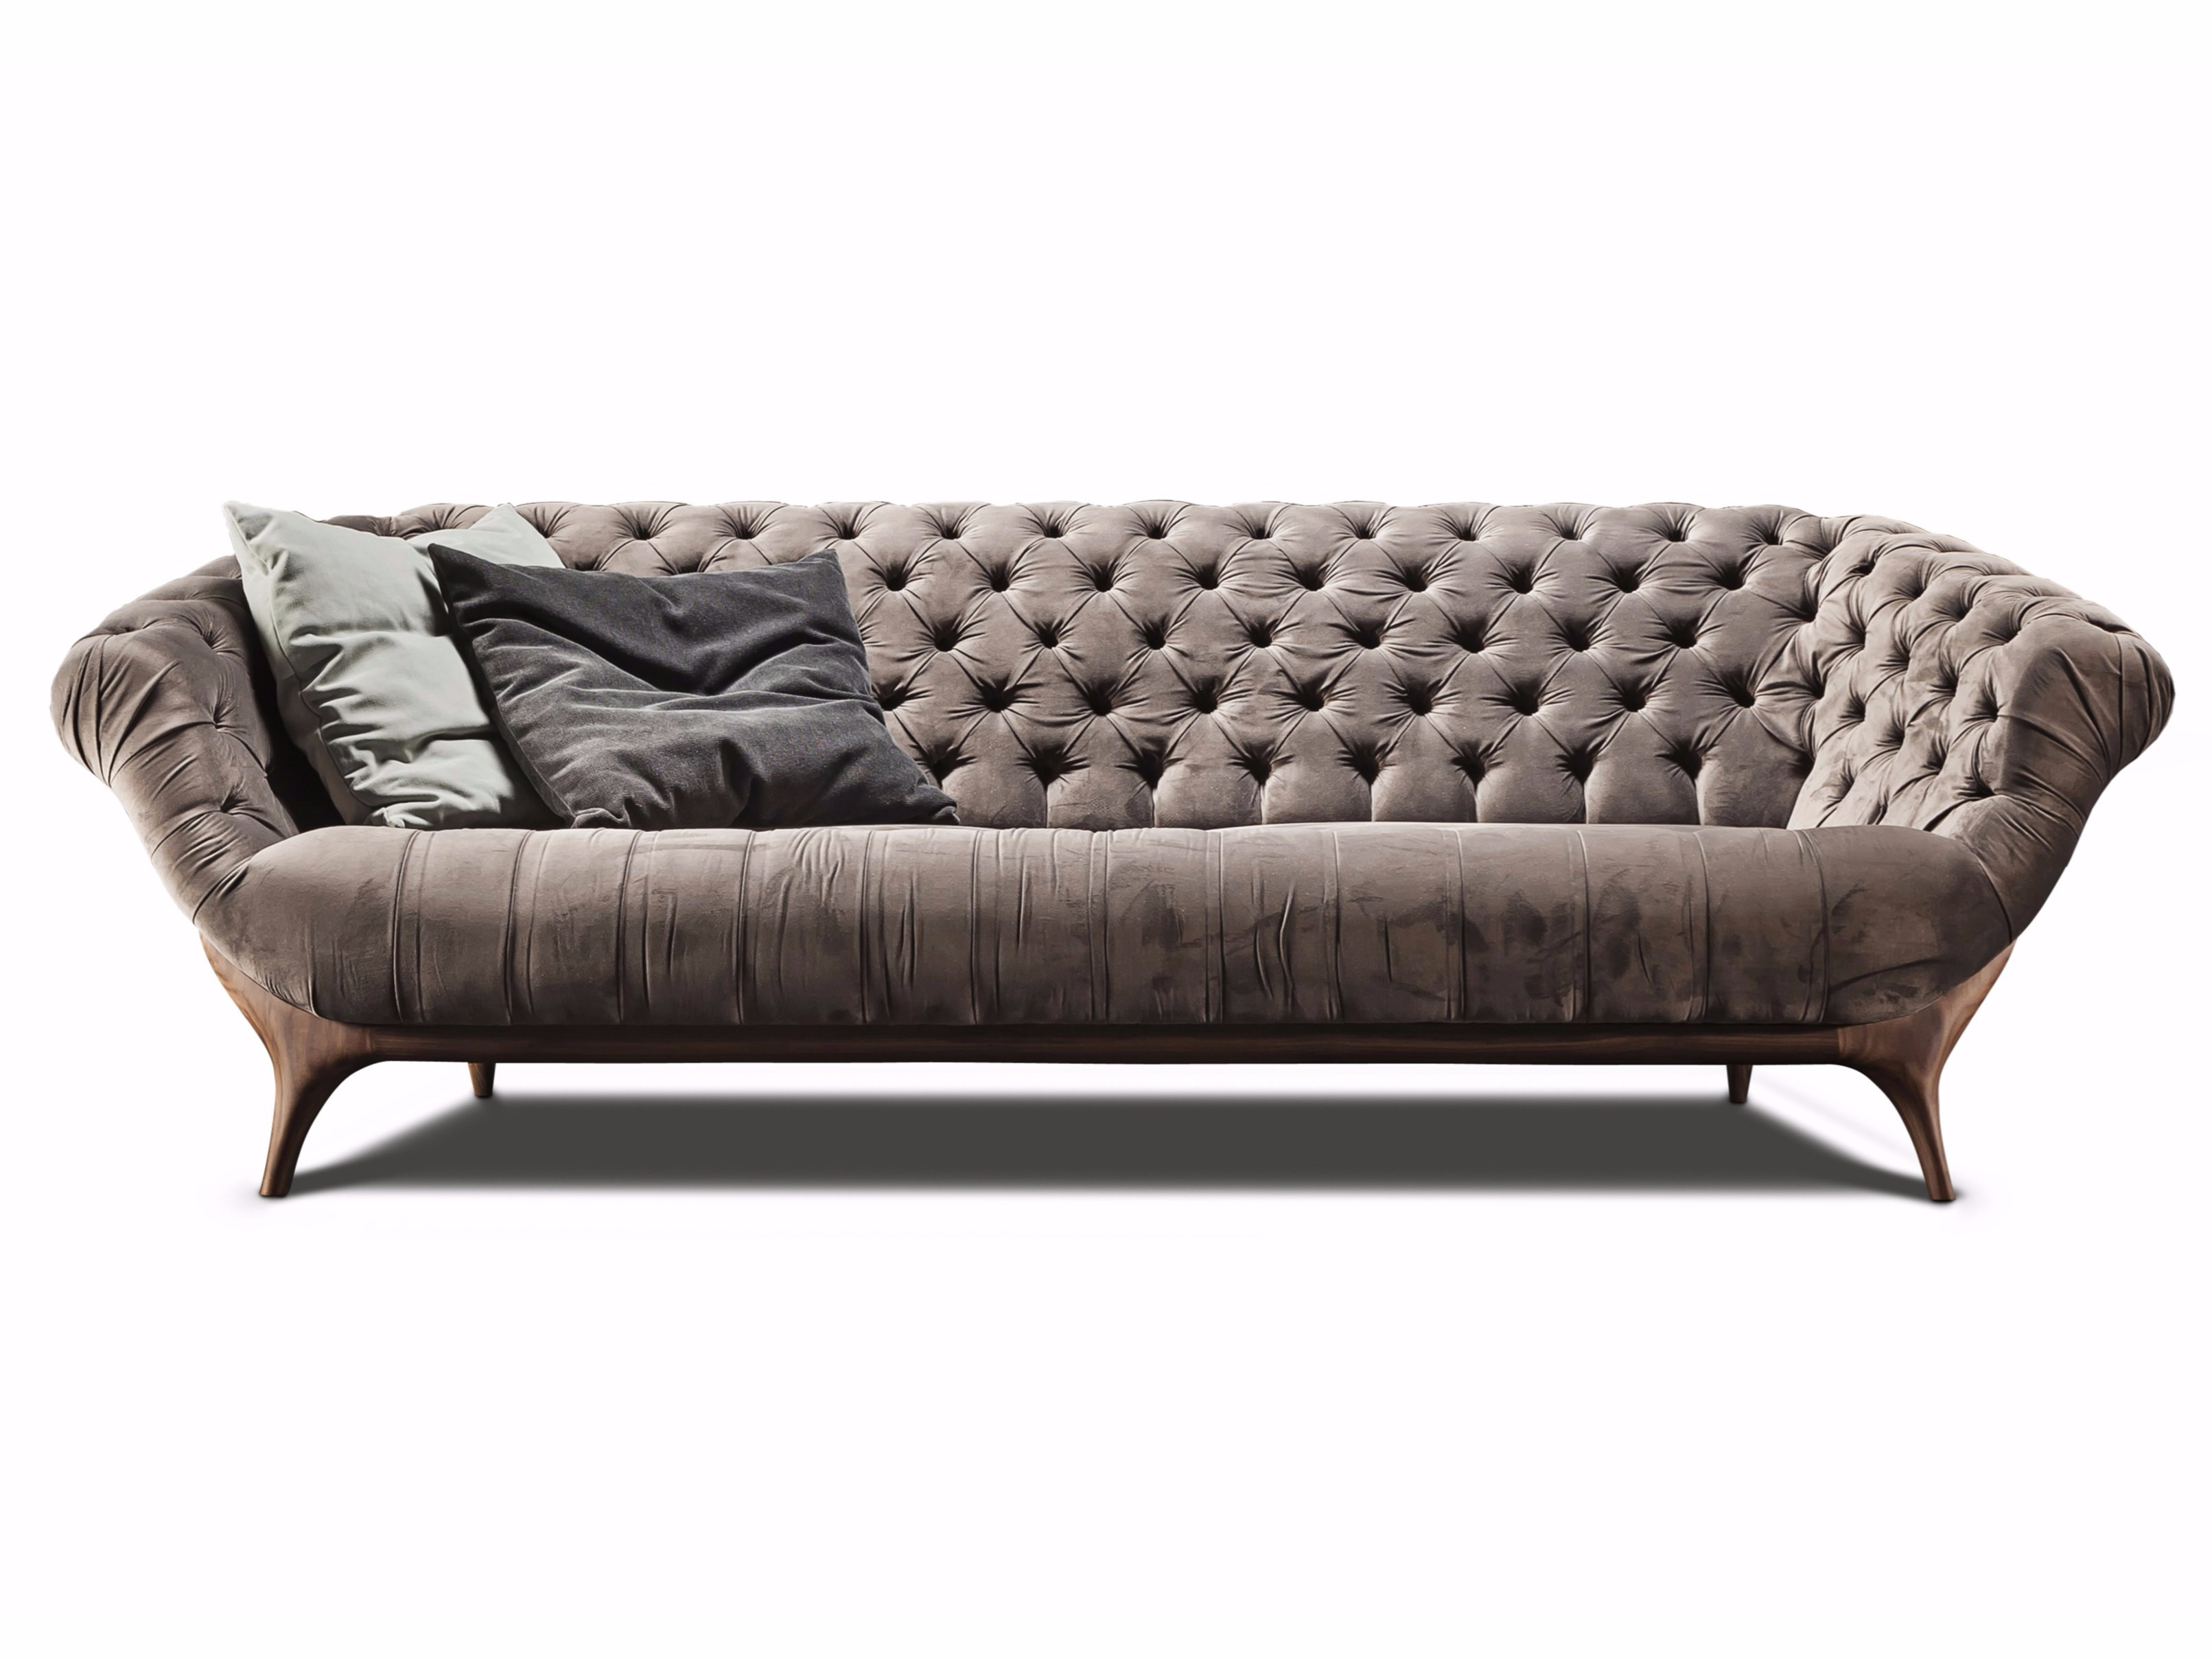 70s Style Sofa Hereo Sofa